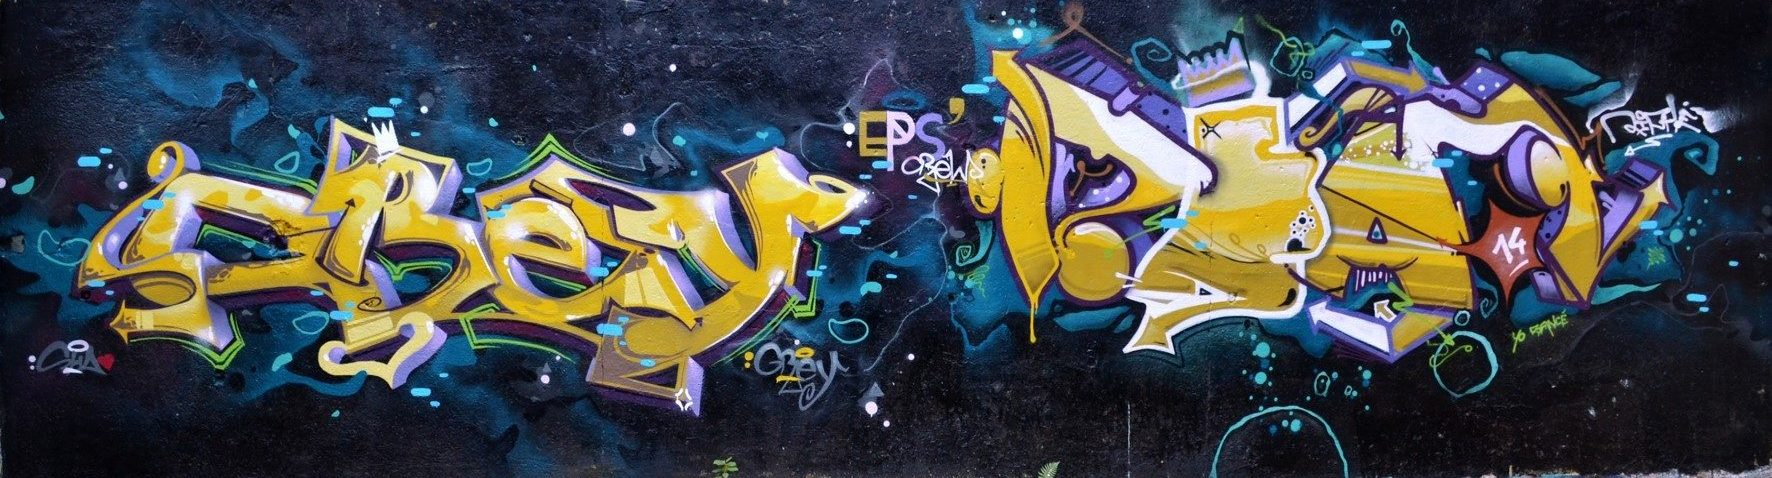 GREY-REAF-FRICHE-SNC-LOMME-2014-1-5